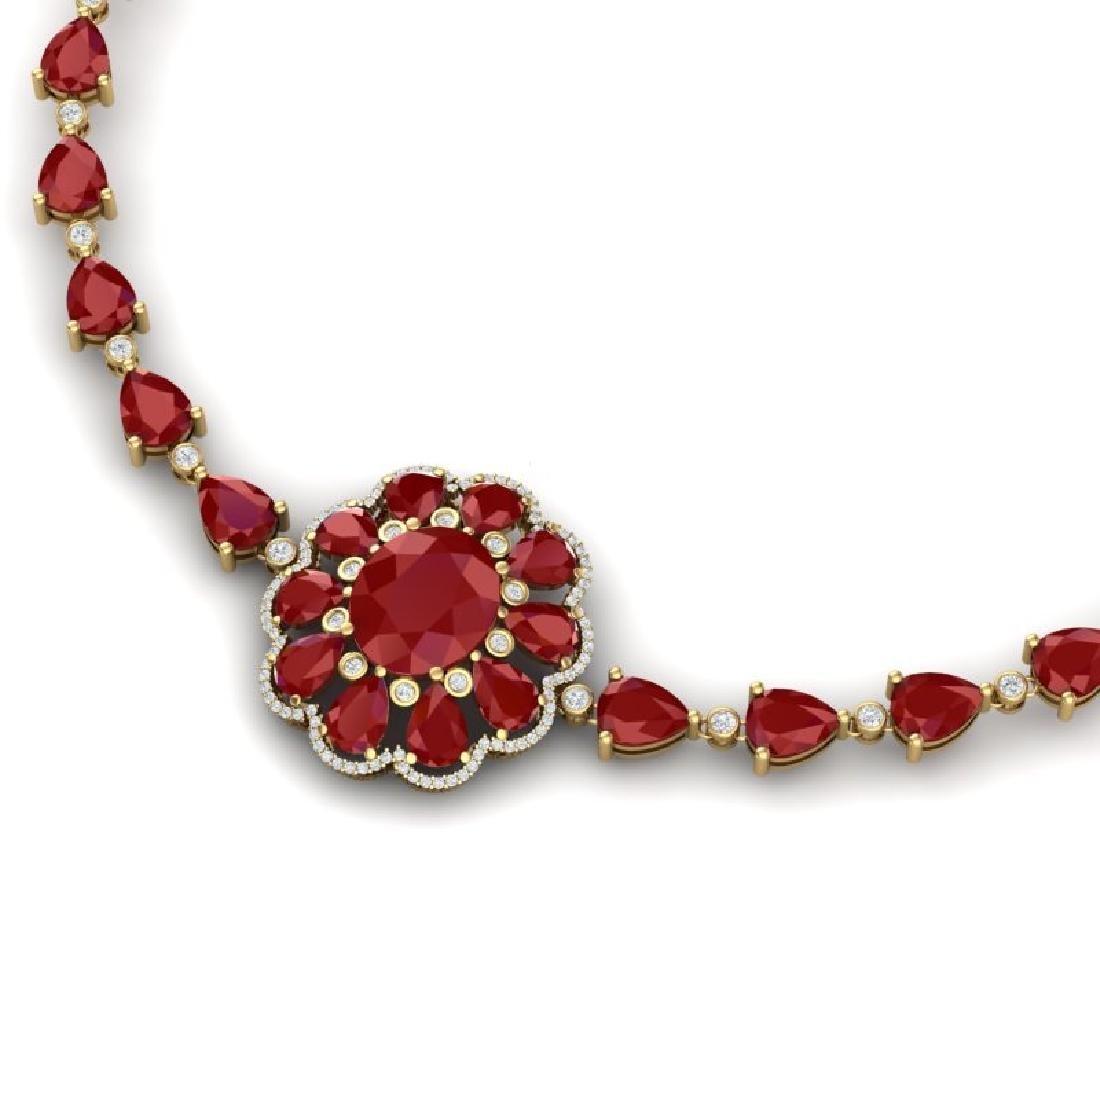 78.98 CTW Royalty Ruby & VS Diamond Necklace 18K Yellow